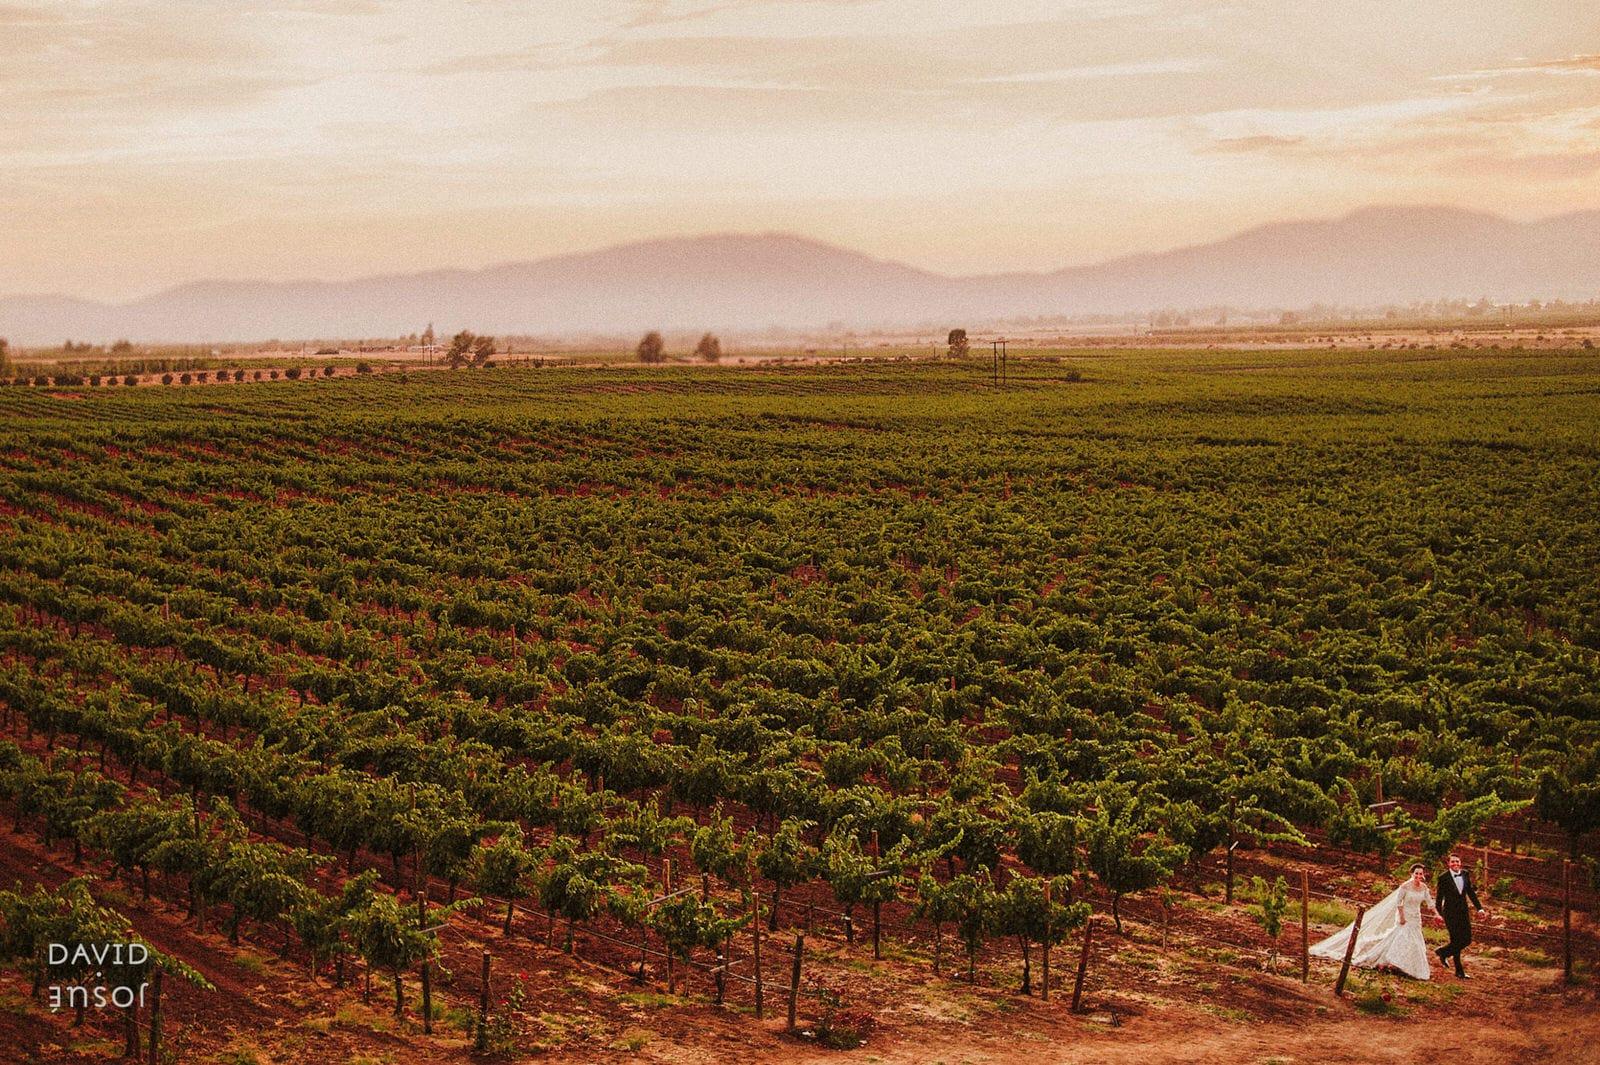 Bride and Groom at Ensenada Baja California Museo del Vino vineyards